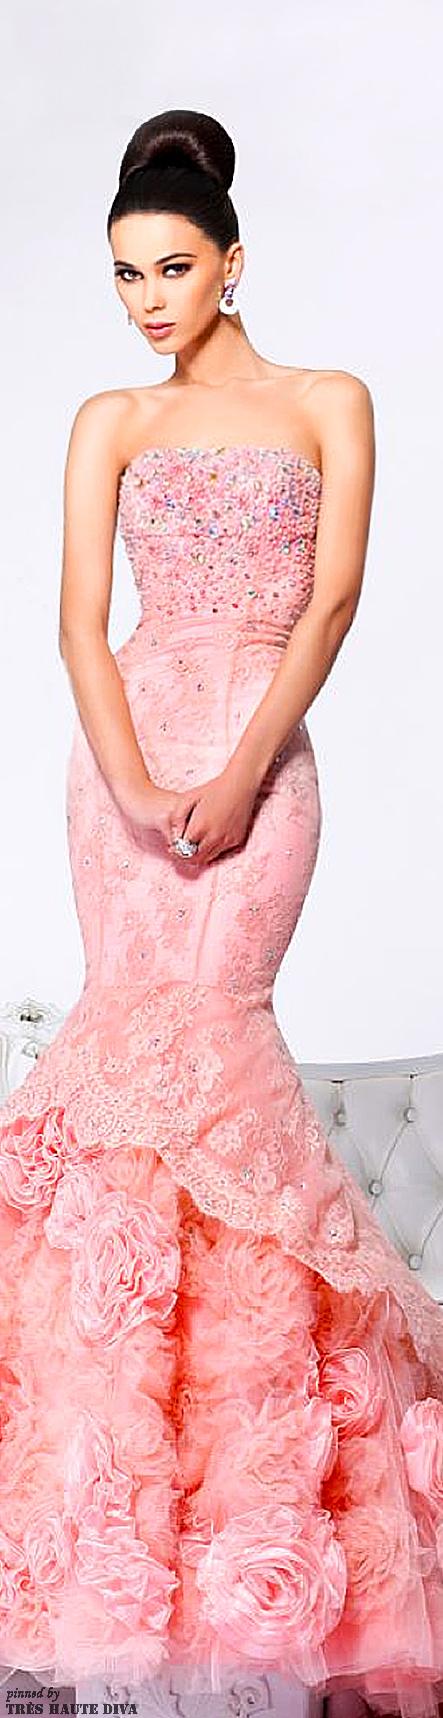 Pin de Adunola Olumodimu en Love dresses | Pinterest | Rosa ...